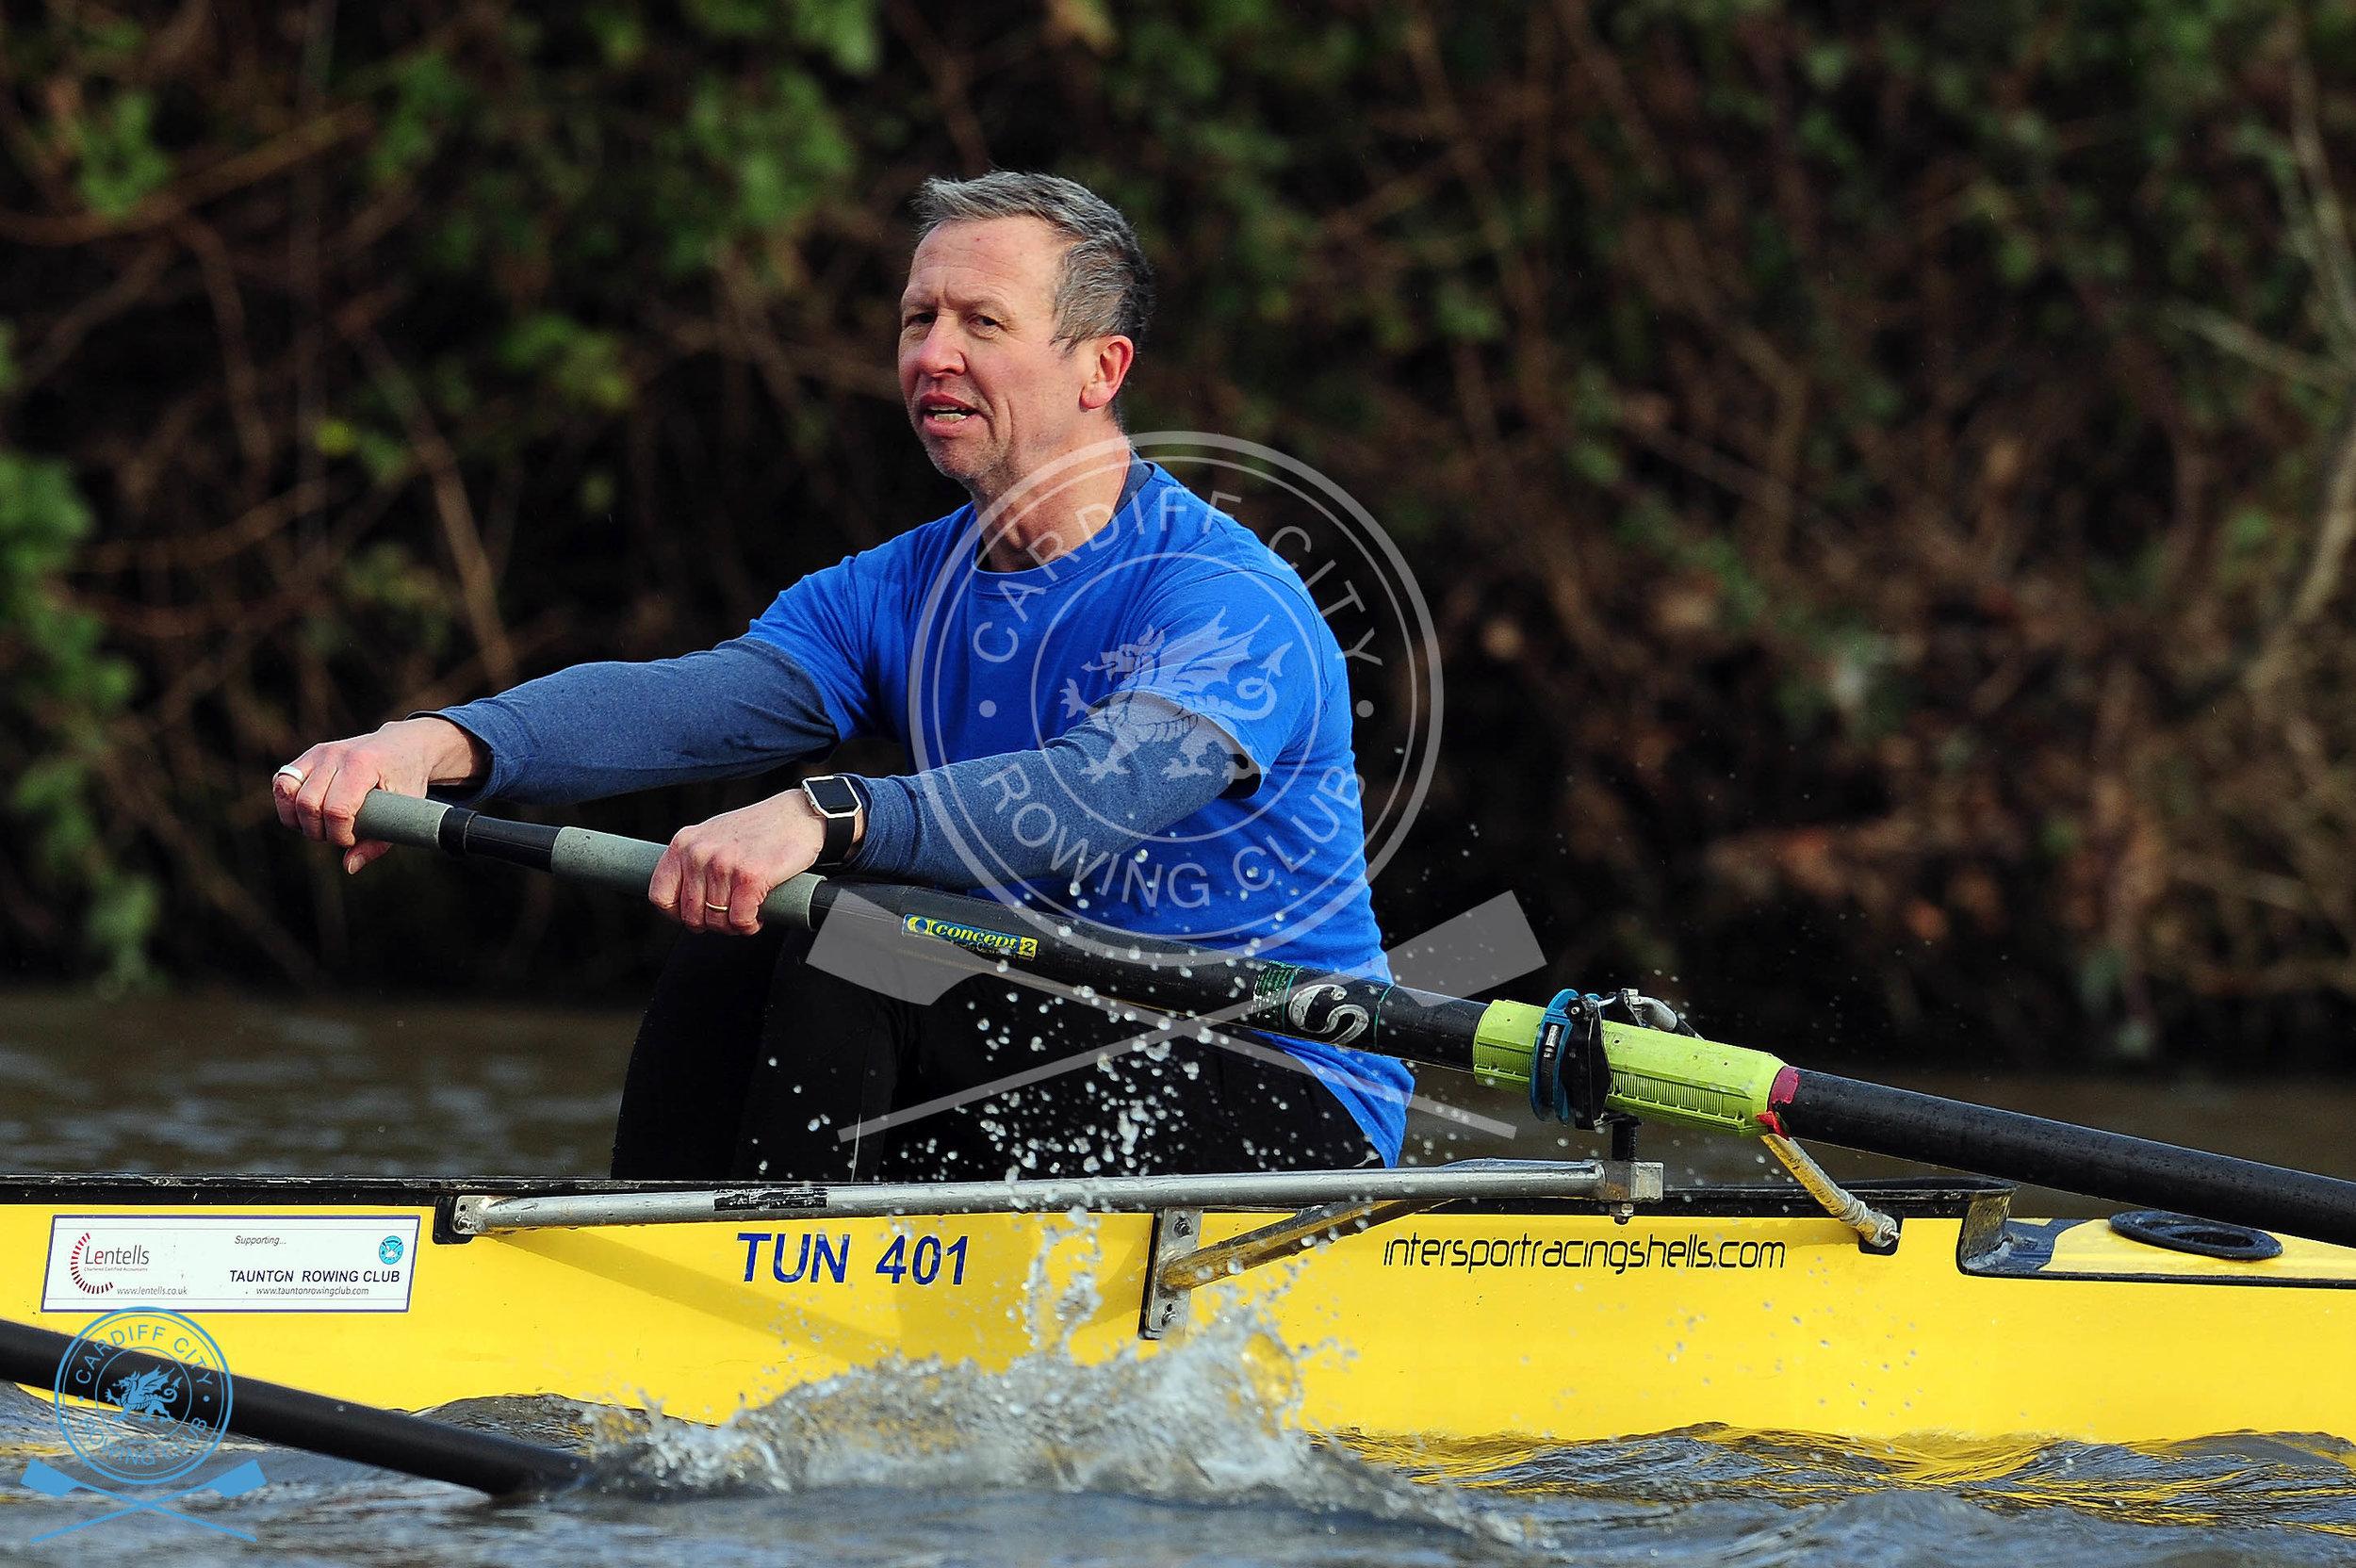 DW_280119_Cardiff_City_Rowing_269.jpg